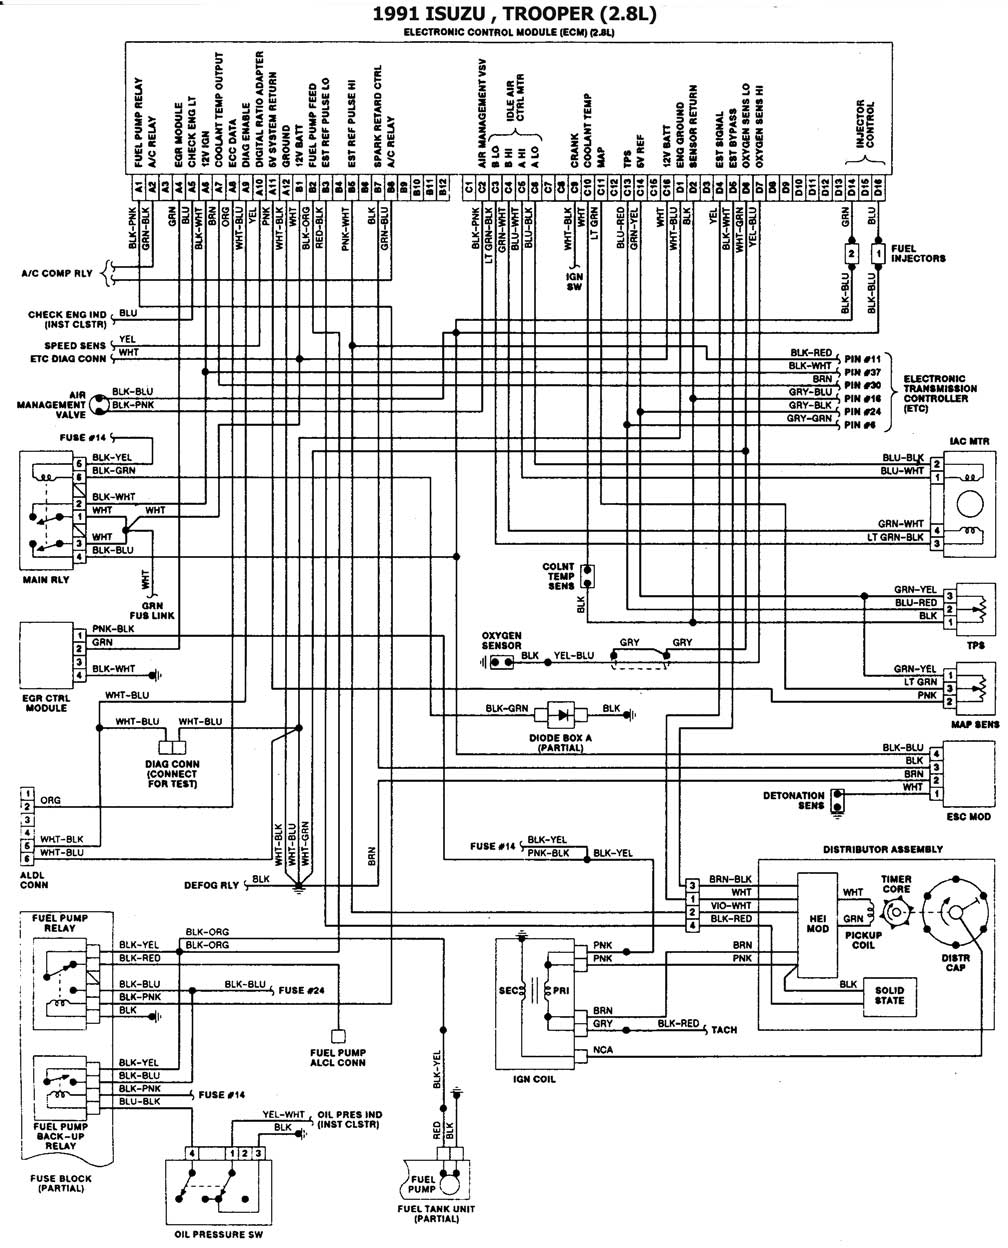 BAB98 91 Trooper Ecm Wiring Diagram | Wiring ResourcesWiring Resources